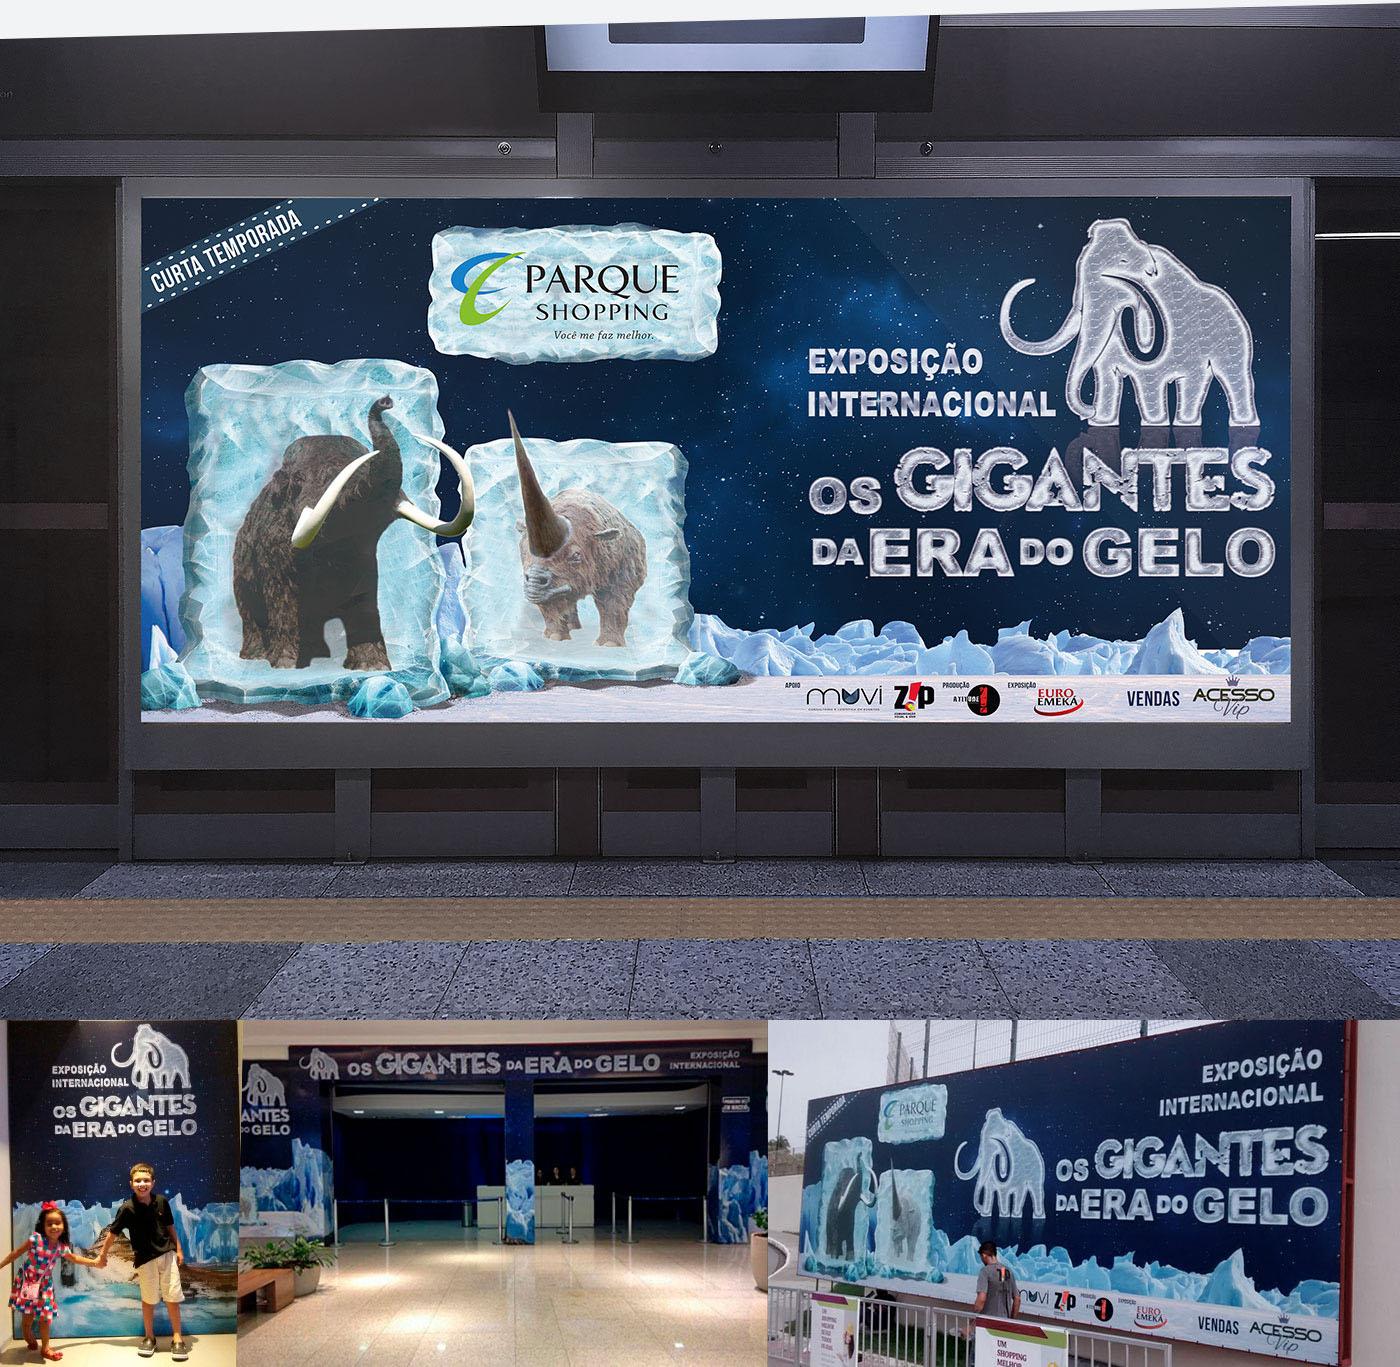 gigantes Era do Gelo mammoth ice Parque Shopping AcessoVip RonaldoTenorio EuroEmka